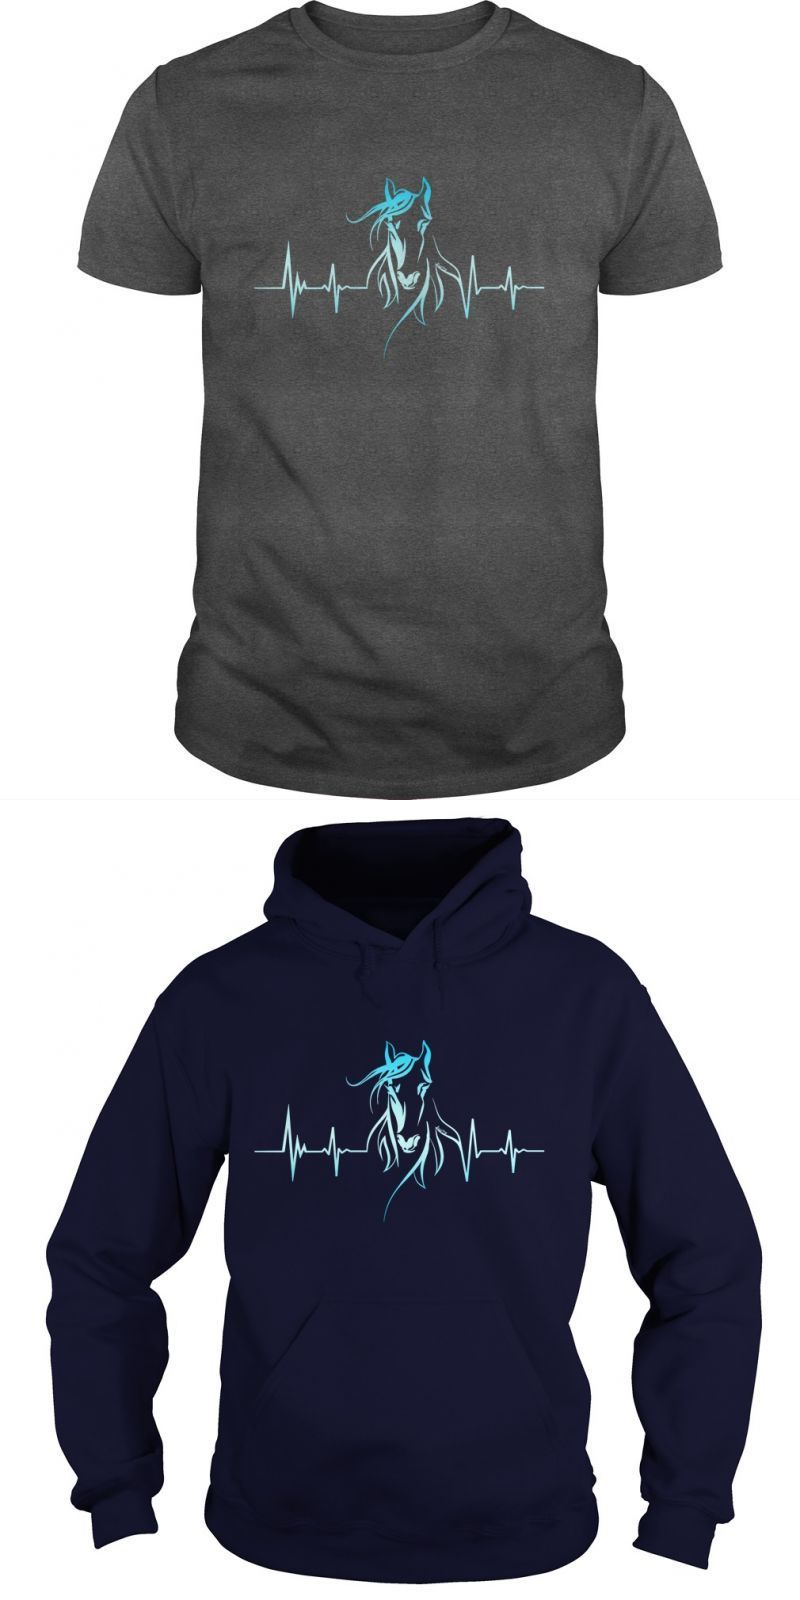 6a35c573f Carousel Horse T Shirt Horse Heartbeat #charlie #kelly #horse #t #shirt #uk  #ladies #horse #t #shirt #neil #young #t #shirt #crazy #horse #t #shirt  #for # ...